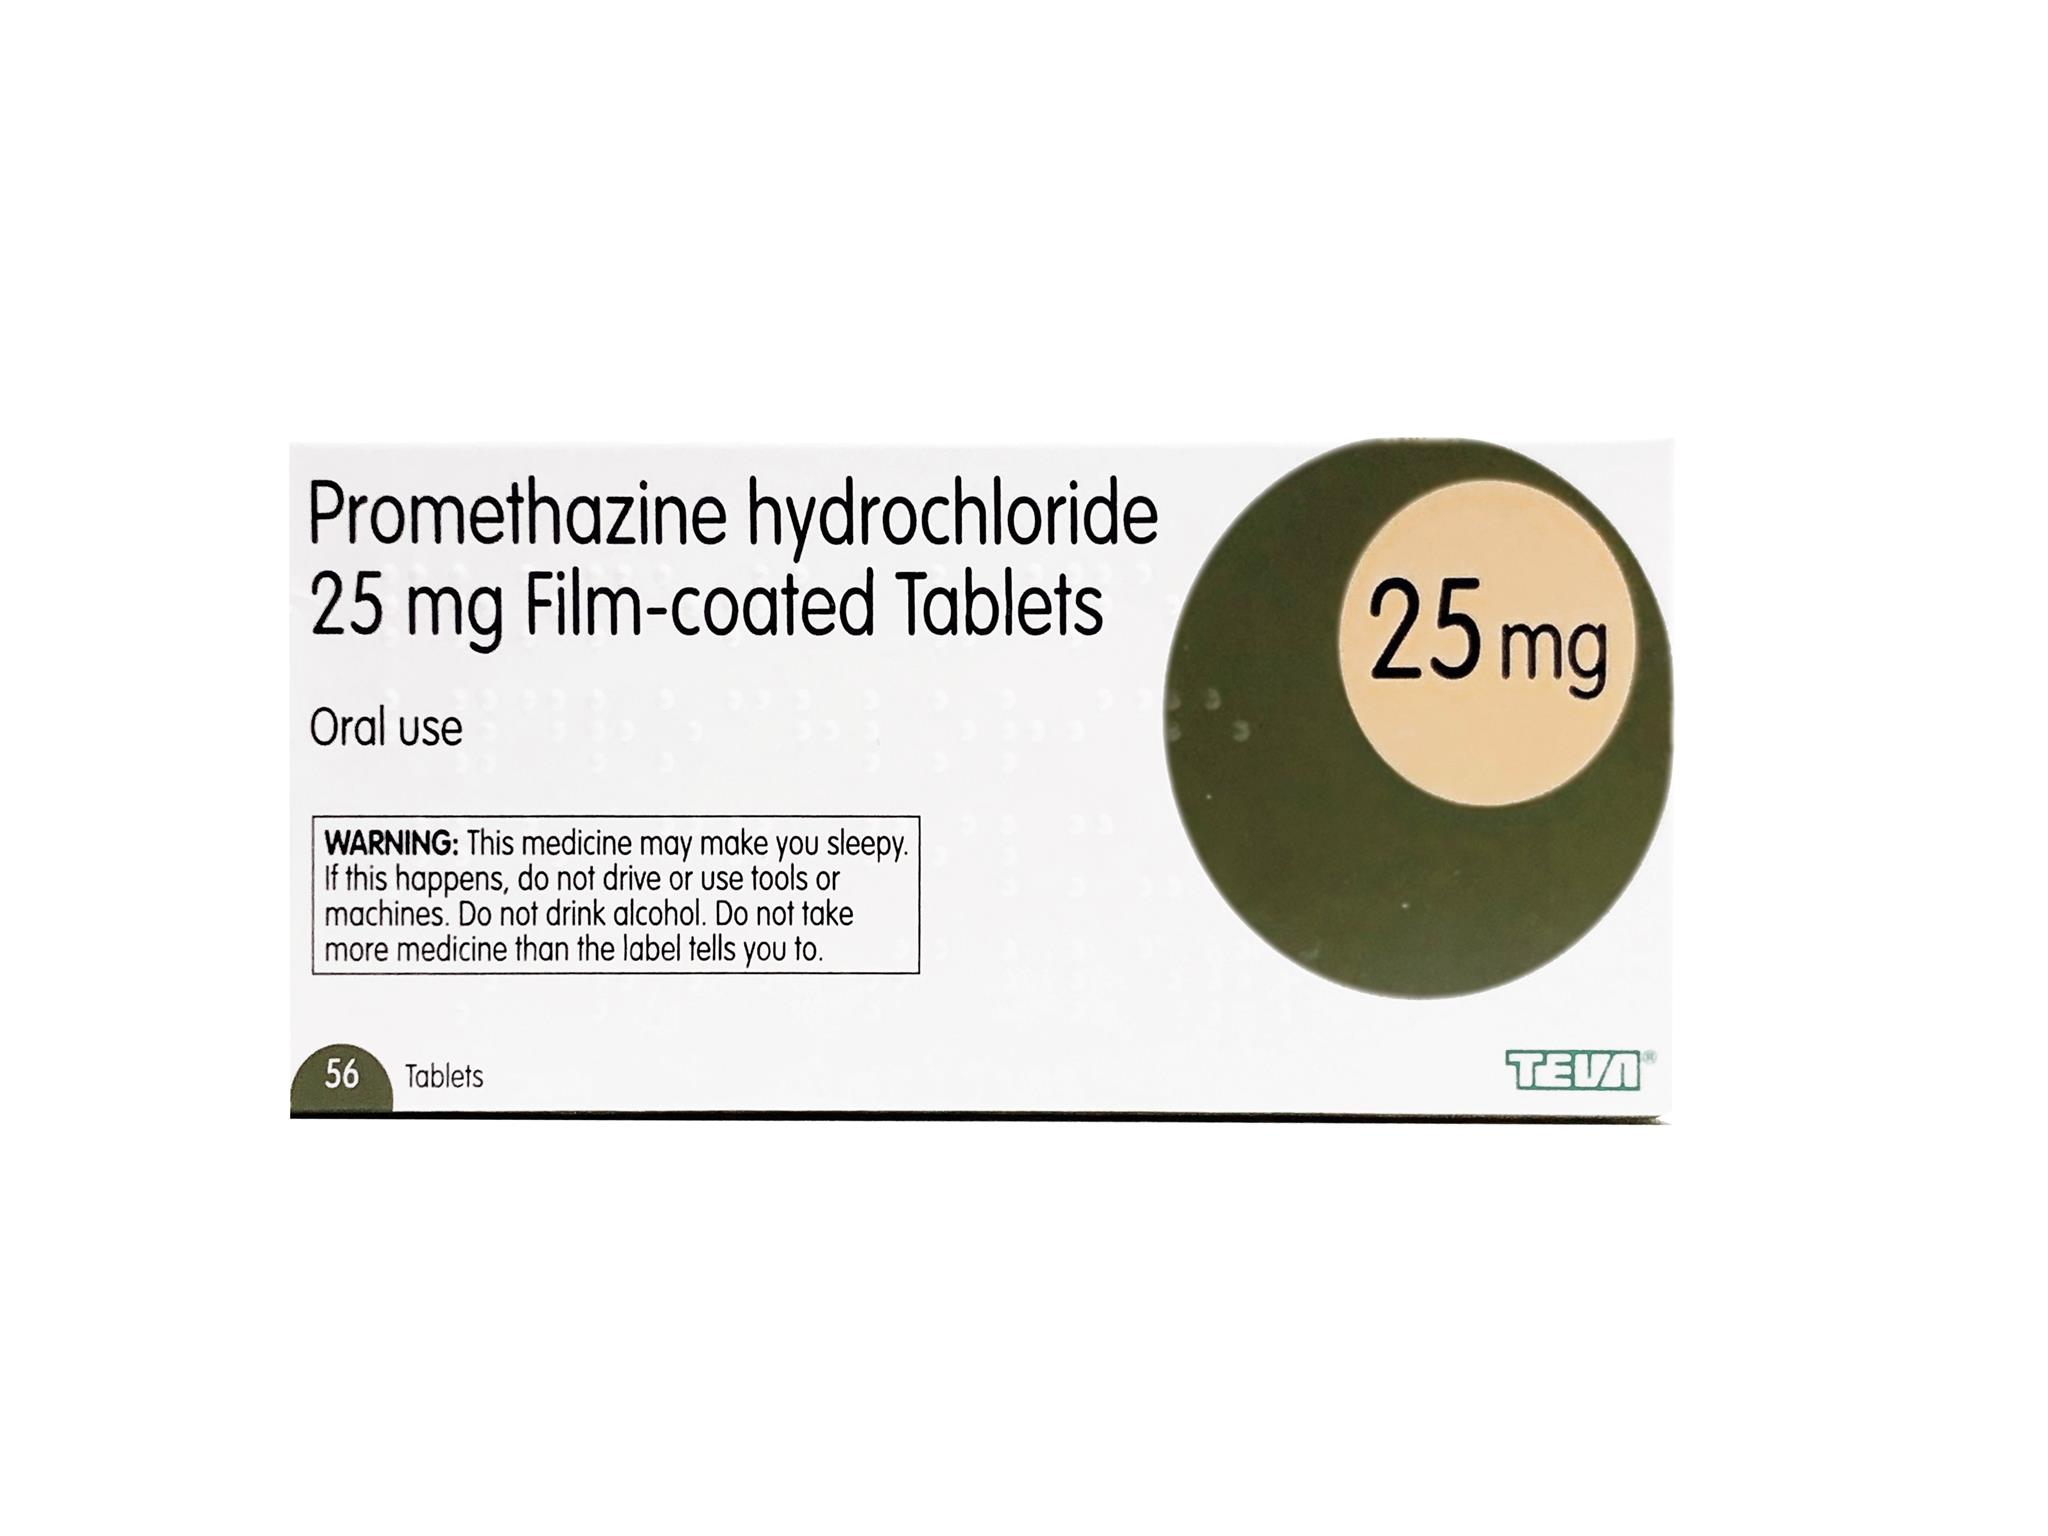 Promethazine Hydrochloride - 56 x 25mg Tablets (Brand May Vary)